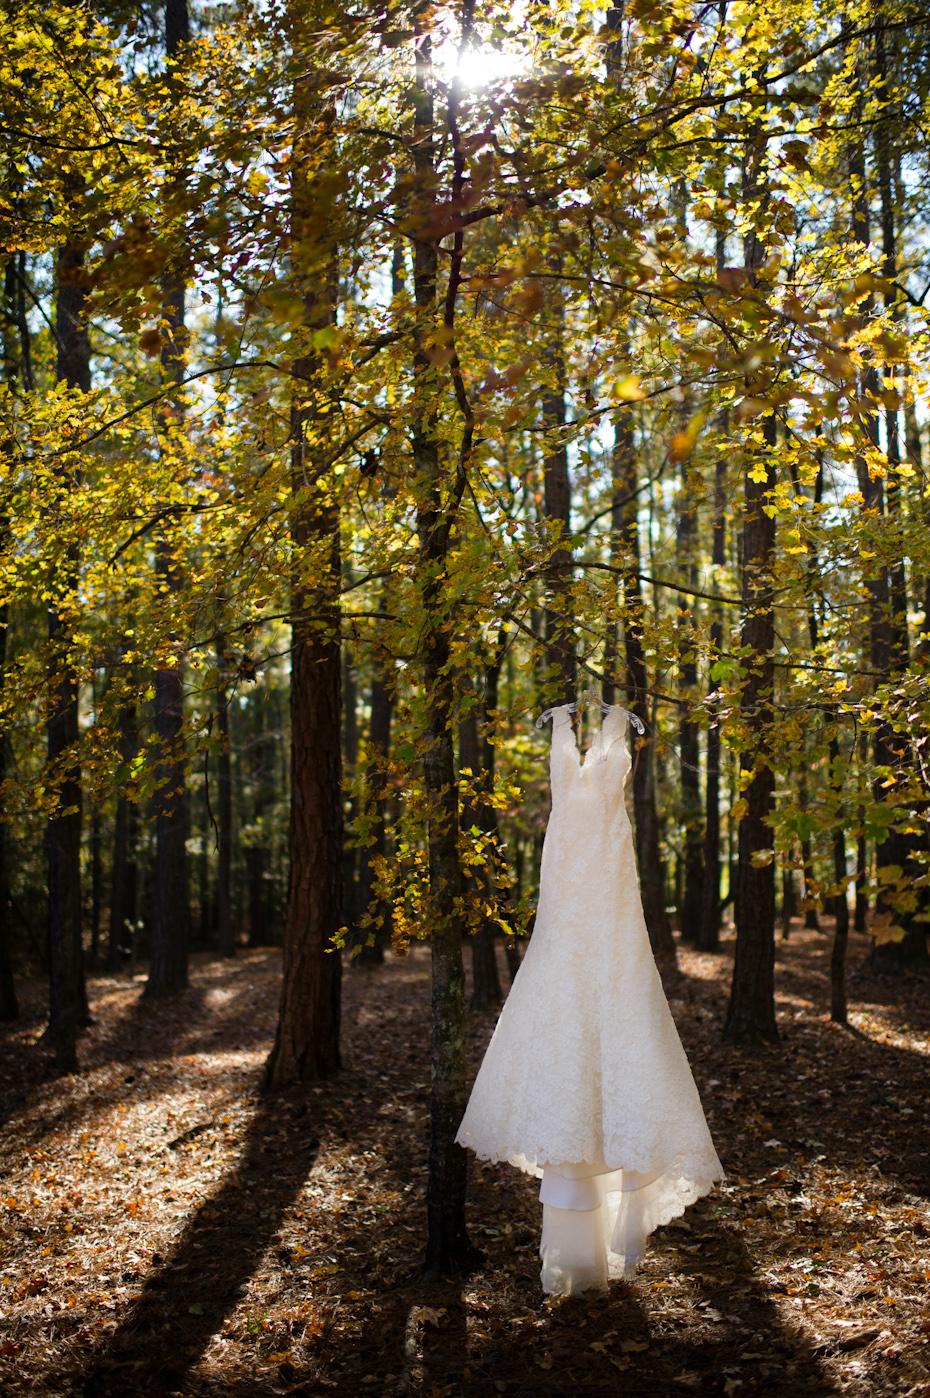 Rivini Wedding Dress from Bridals by Lori